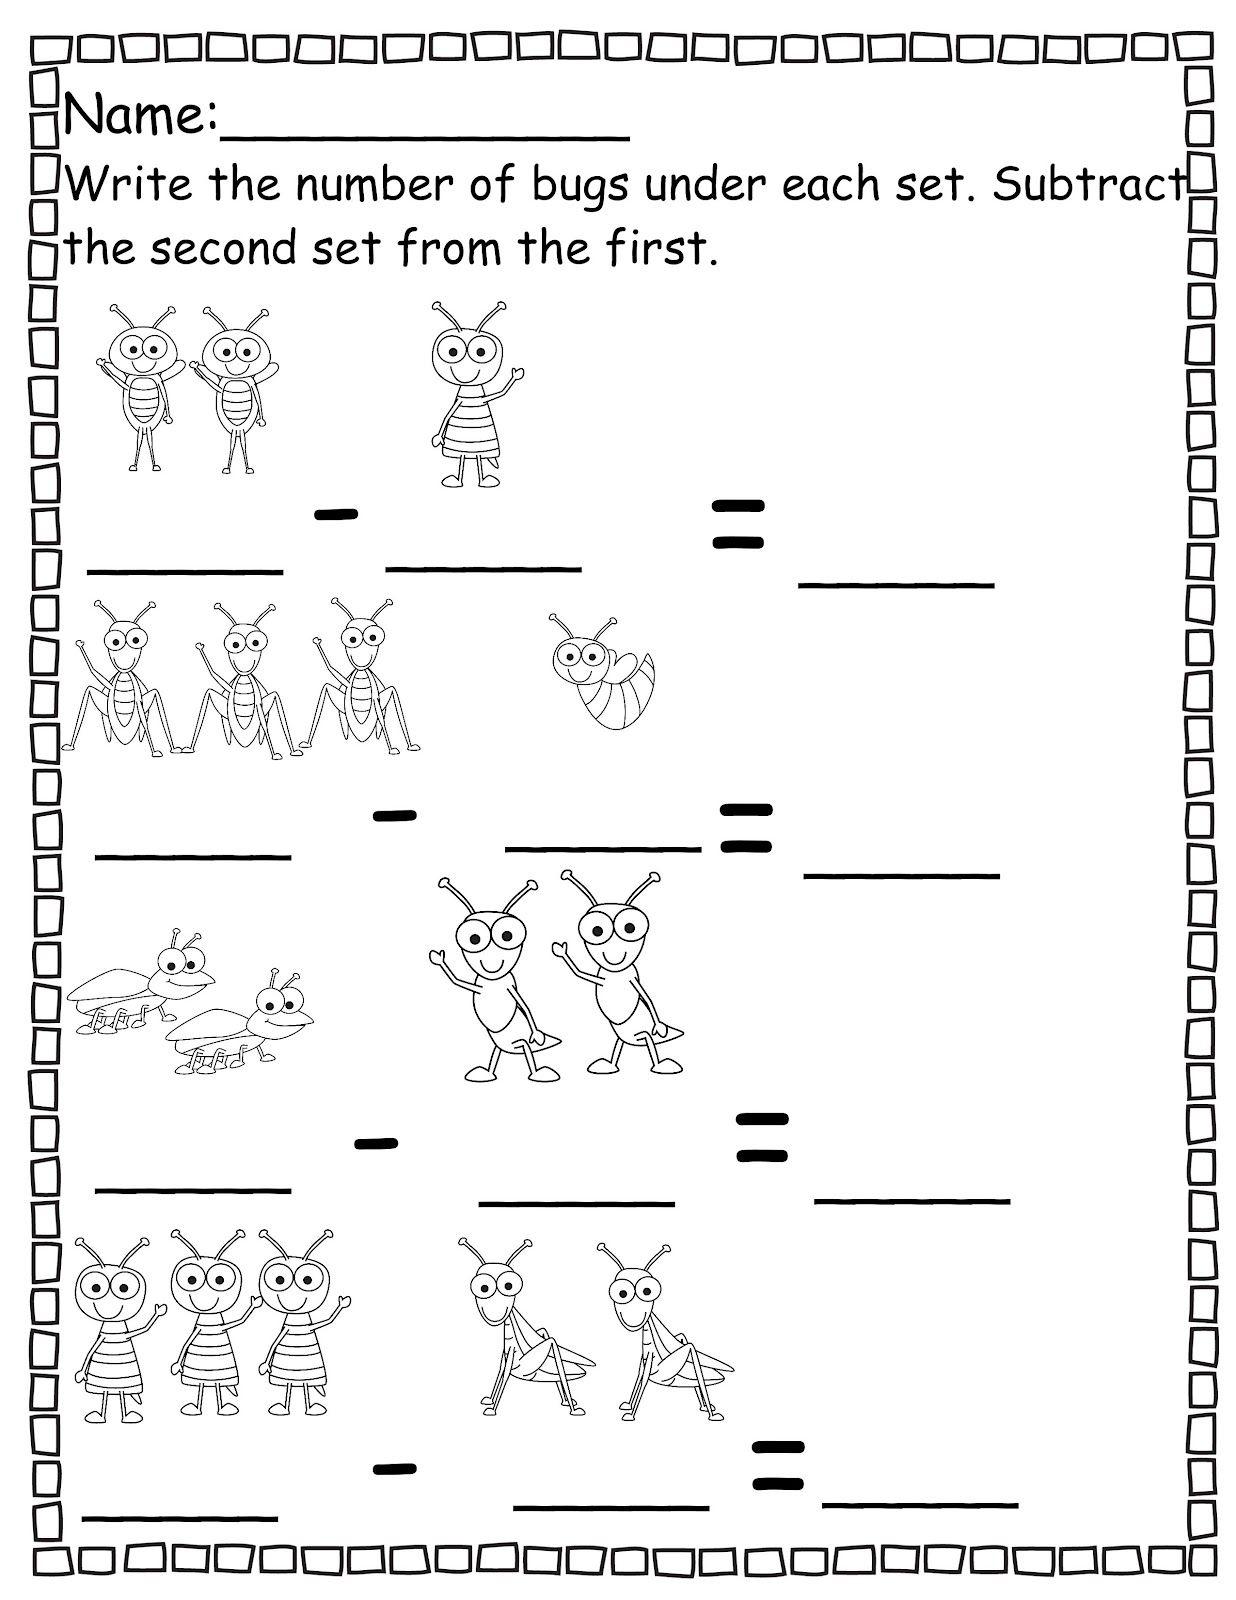 The Crazy Pre K Classroom Free Printables Kindergarten Math Worksheets Addition Pre K Worksheets Kindergarten Math Worksheets [ 1600 x 1236 Pixel ]